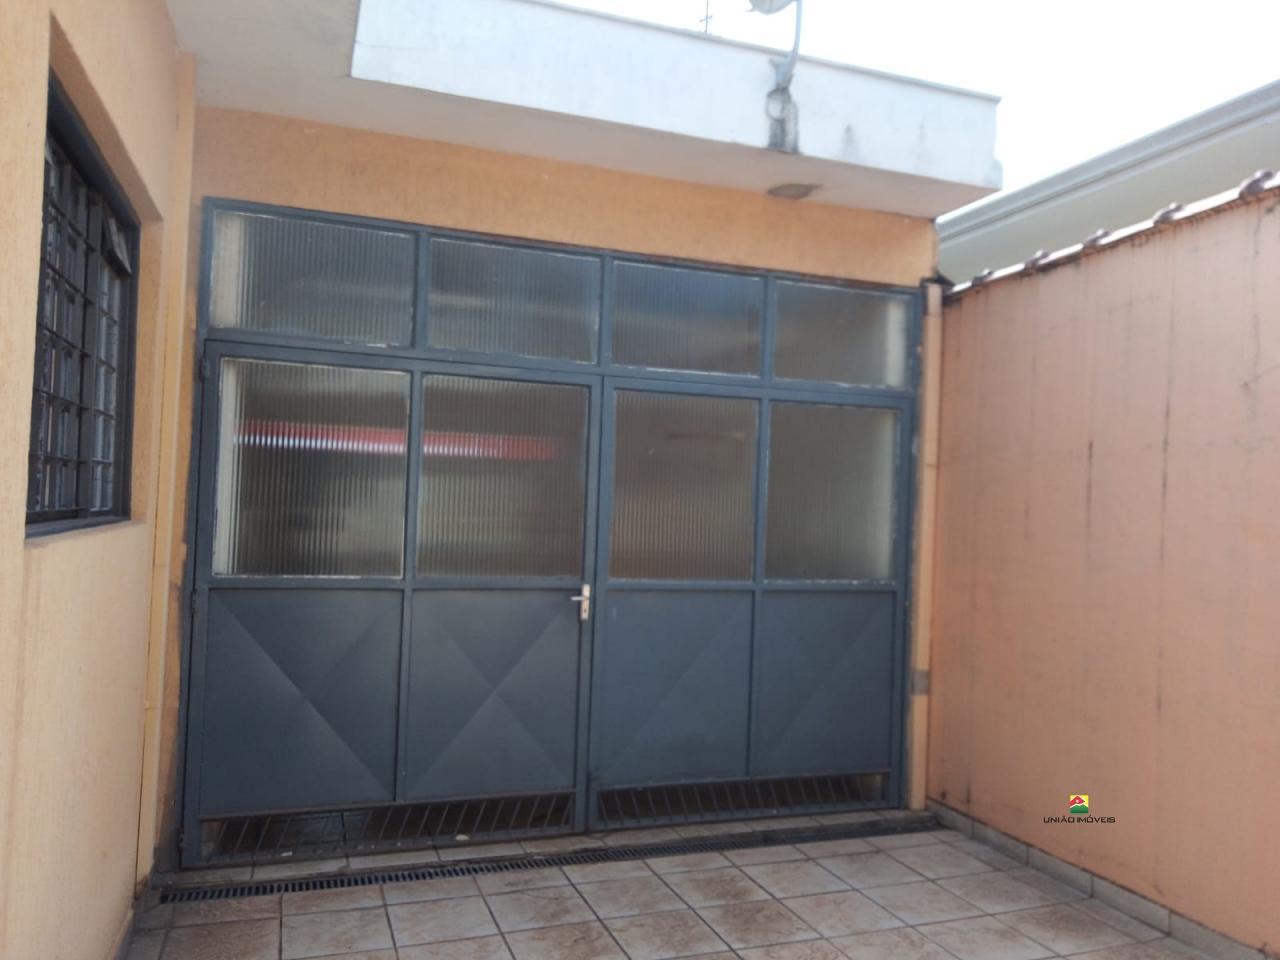 http://www2.sgn2.com.br/clientes/itirapina/loc/l1300a.jpg